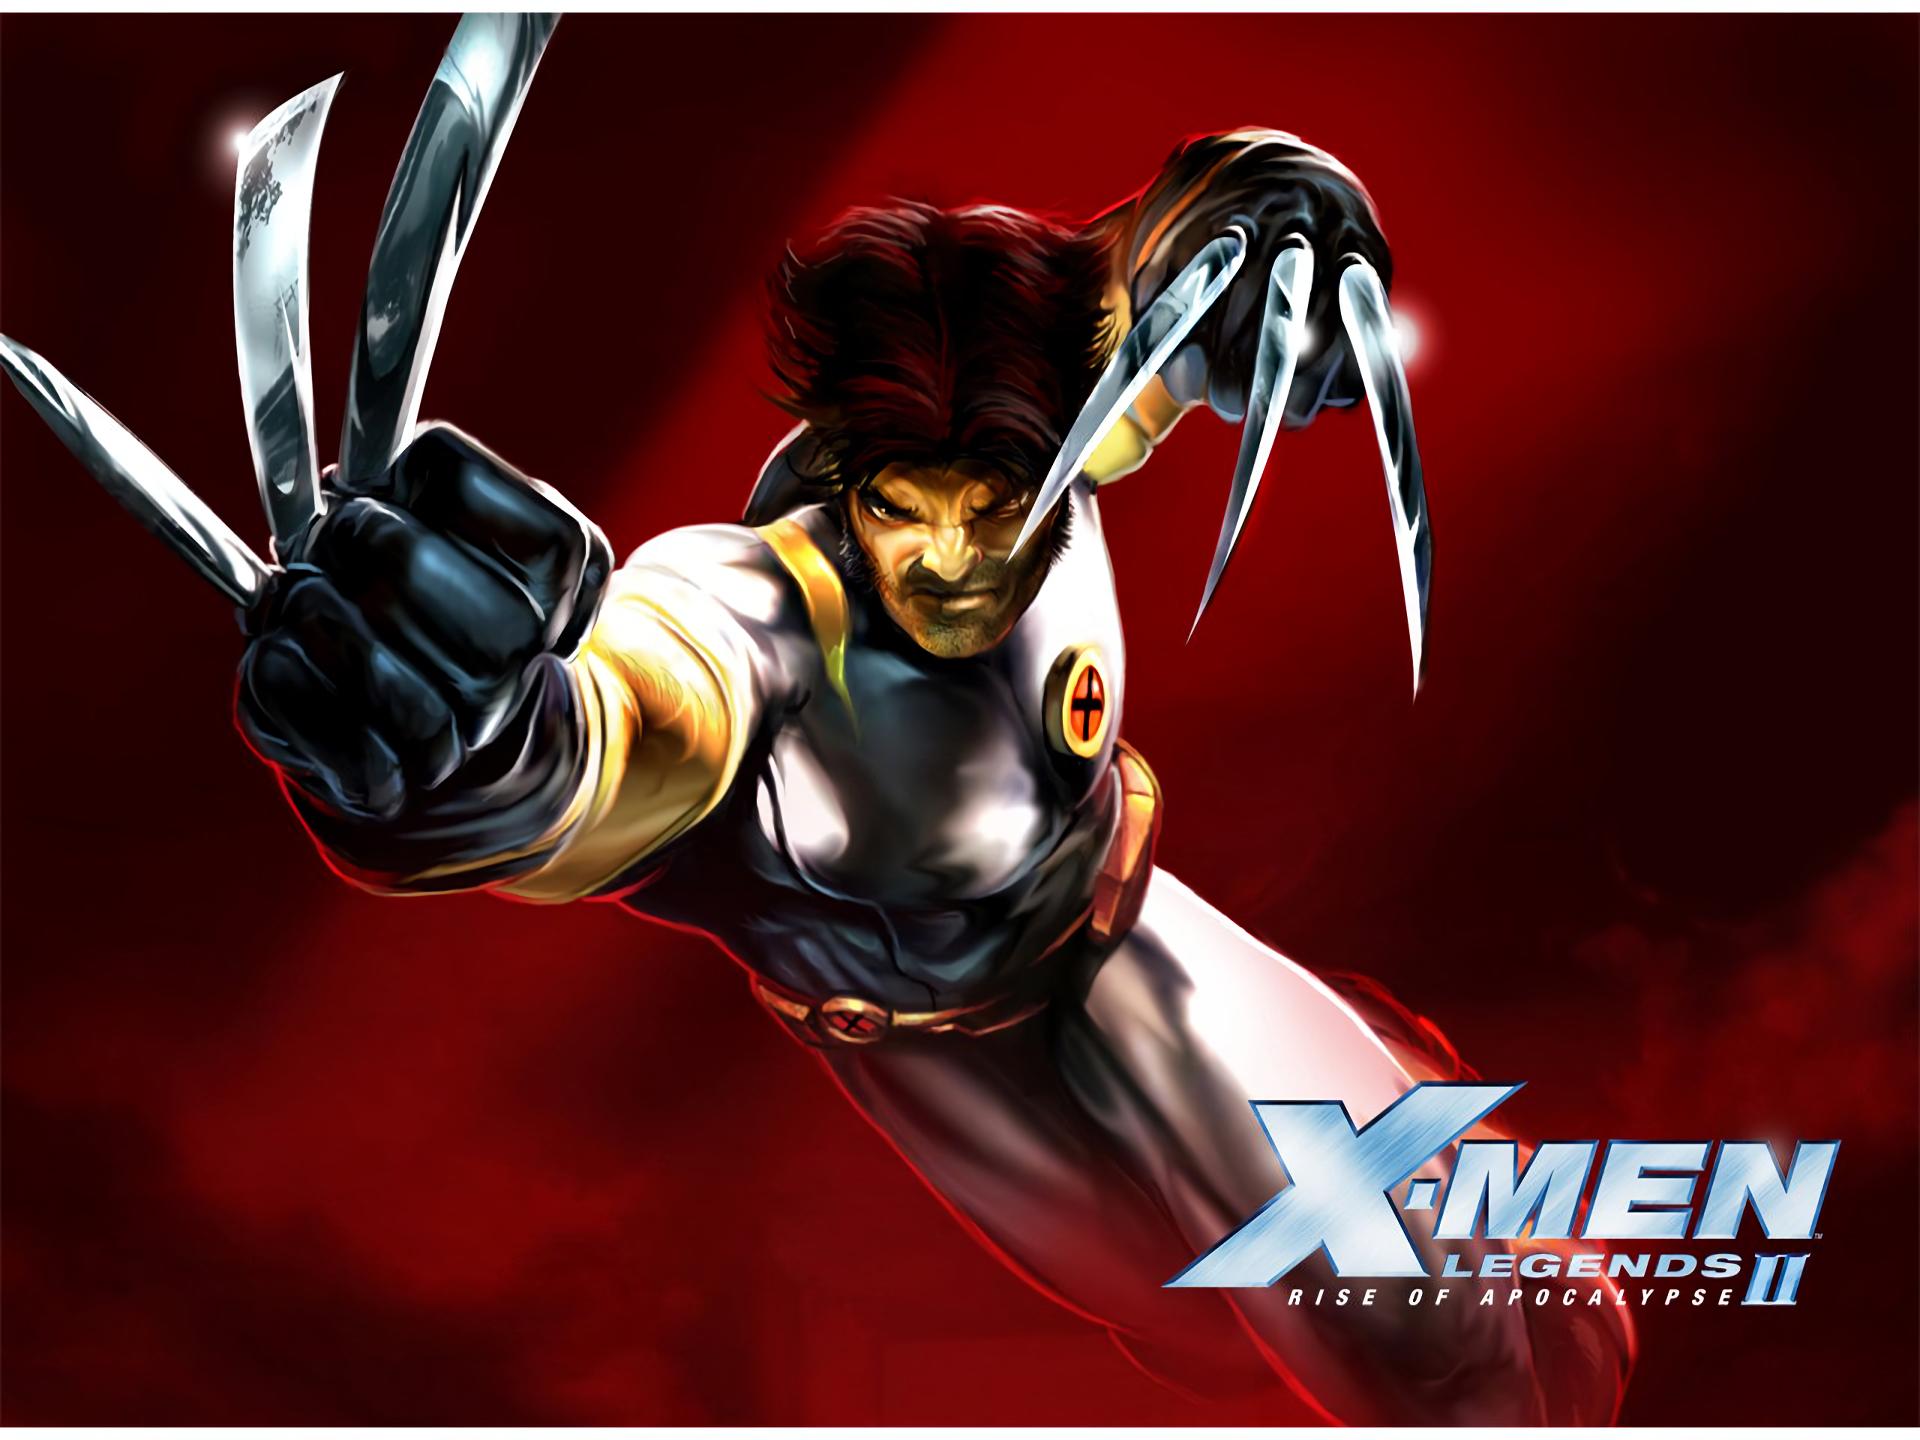 X Men Legends II Rise Of Apocalypse HD Wallpaper